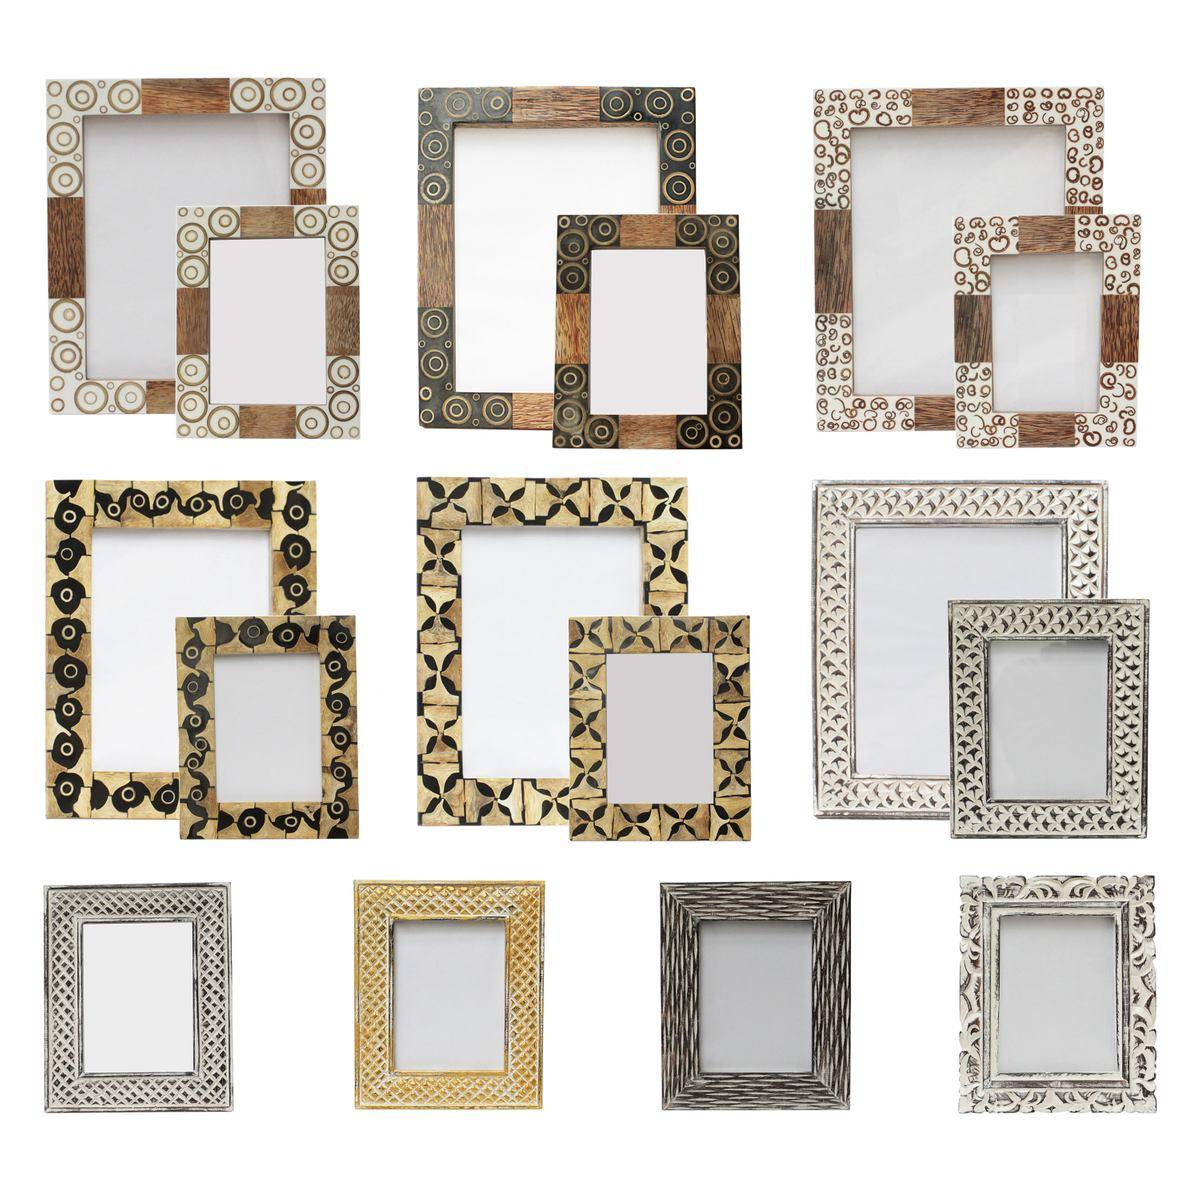 Holzbilderrahmen Fotorahmen Bilderrahmen mit Glas Rahmen aus Kokosholz 13x18 cm oder 20x25 cm